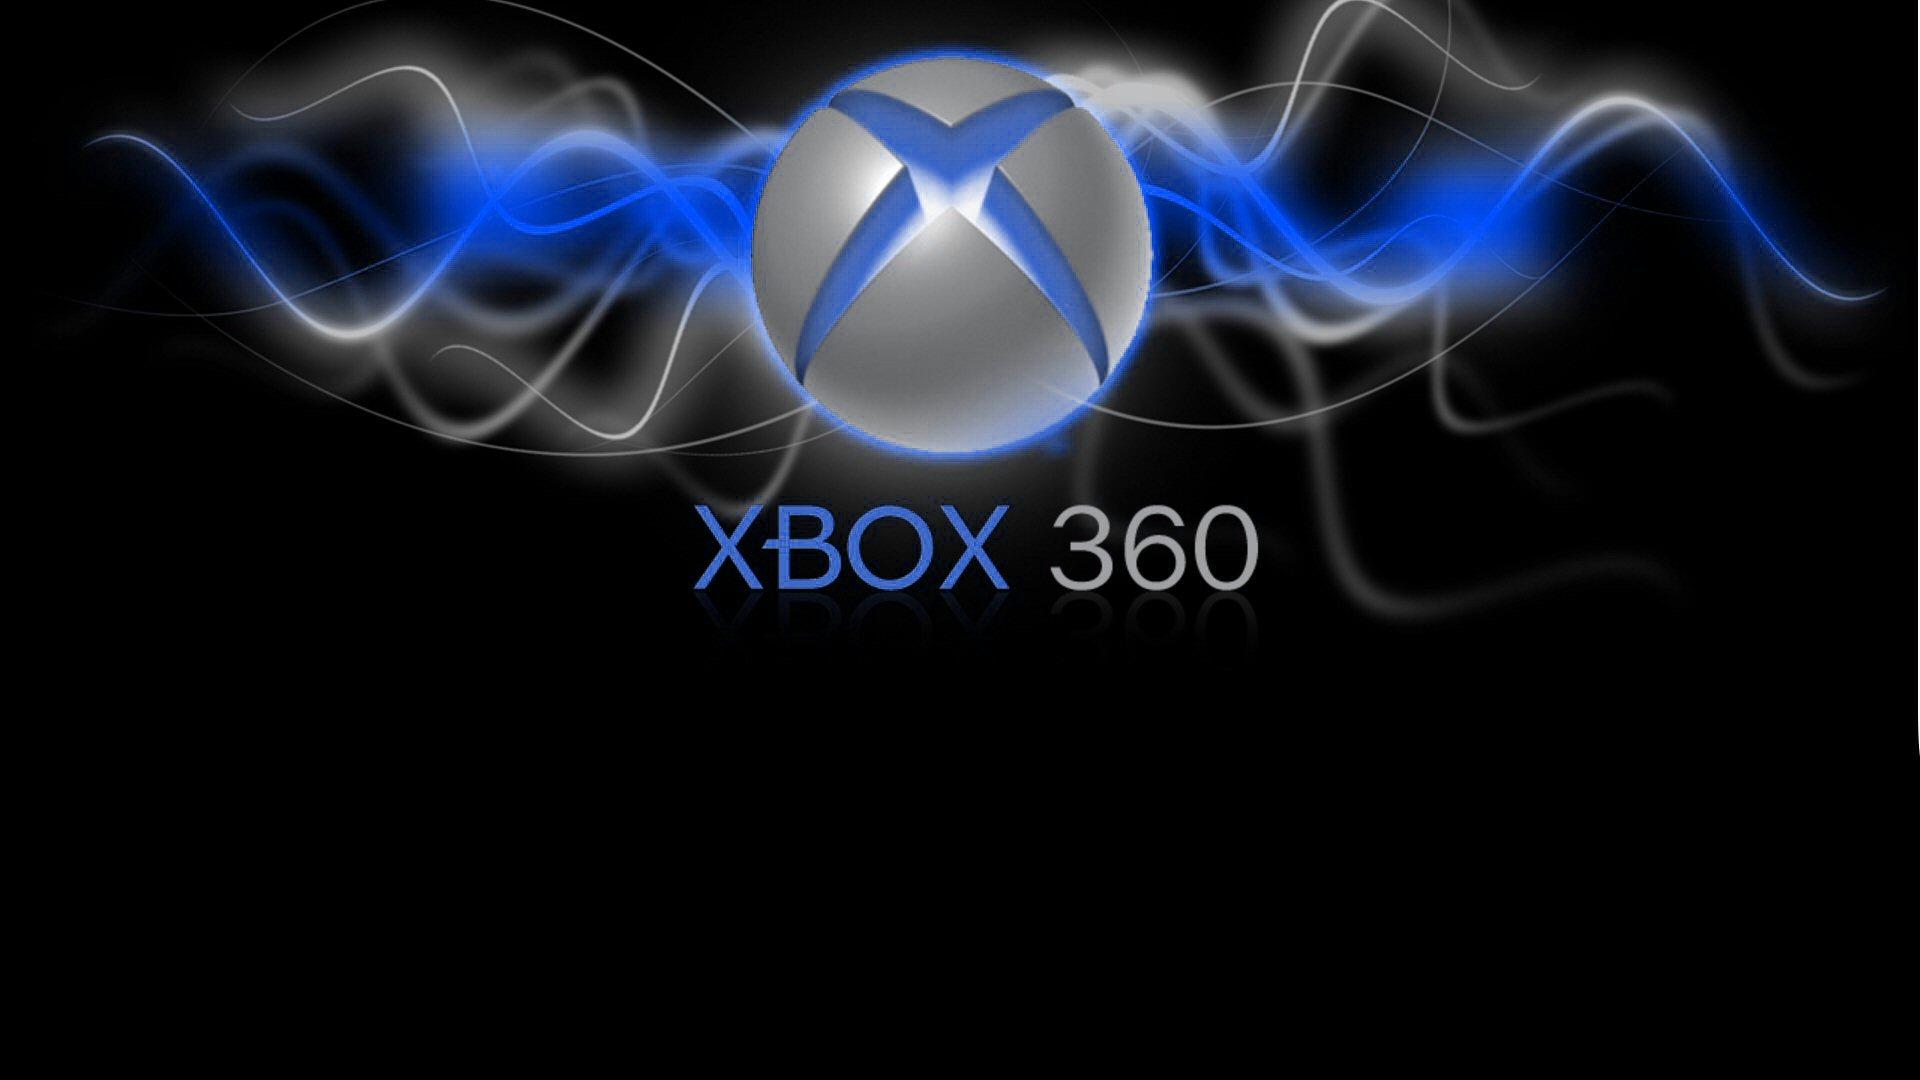 <b>Wallpaper</b> for <b>Xbox</b> 360 - WallpaperSafari